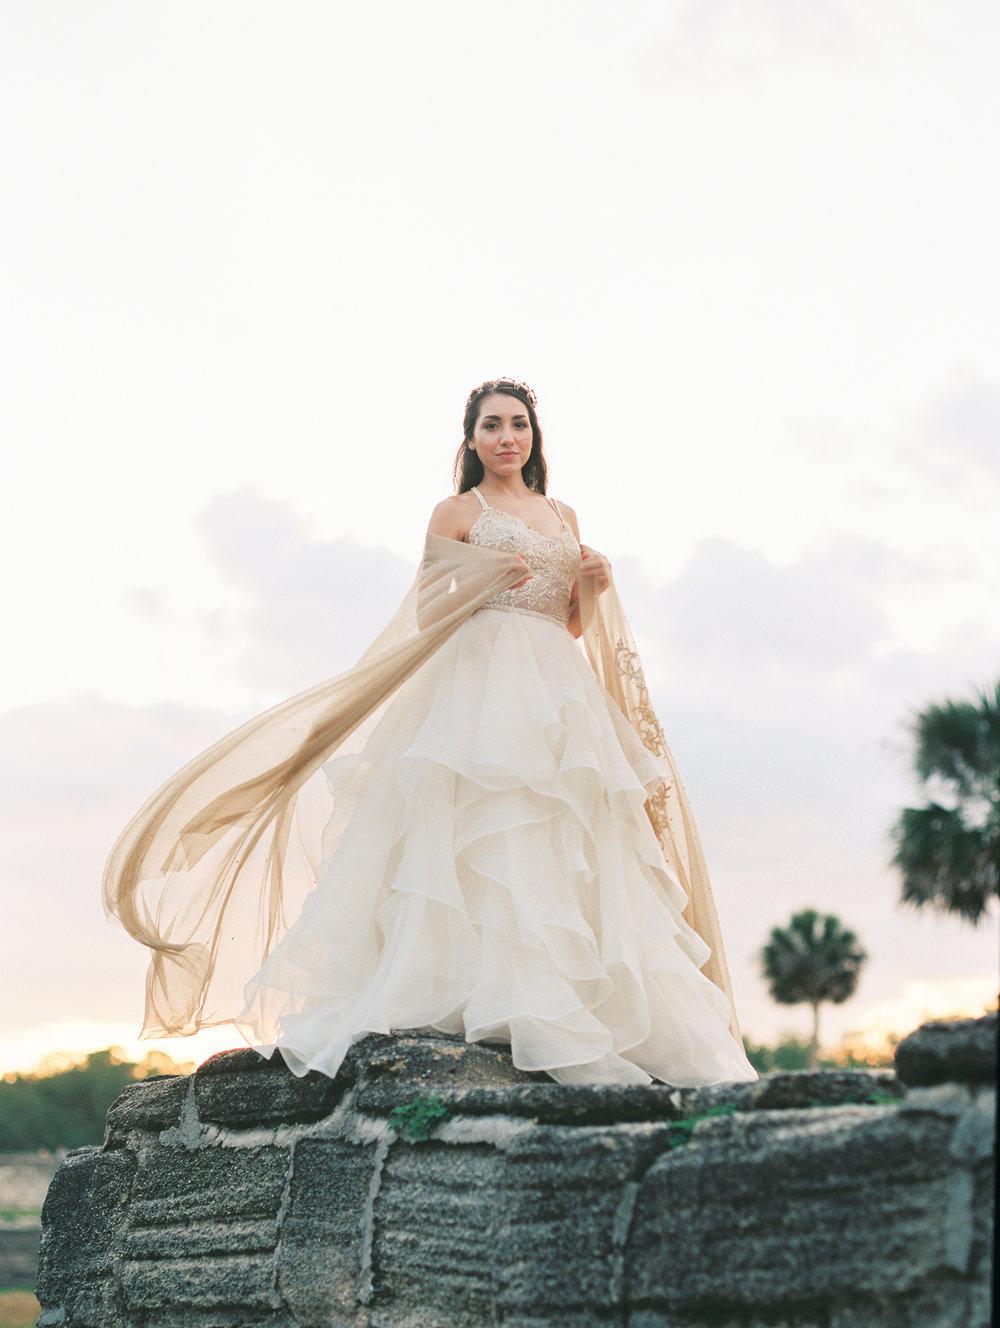 St. augustine, castillo de san marcos styled wedding bridal photo, wedding dress sunset